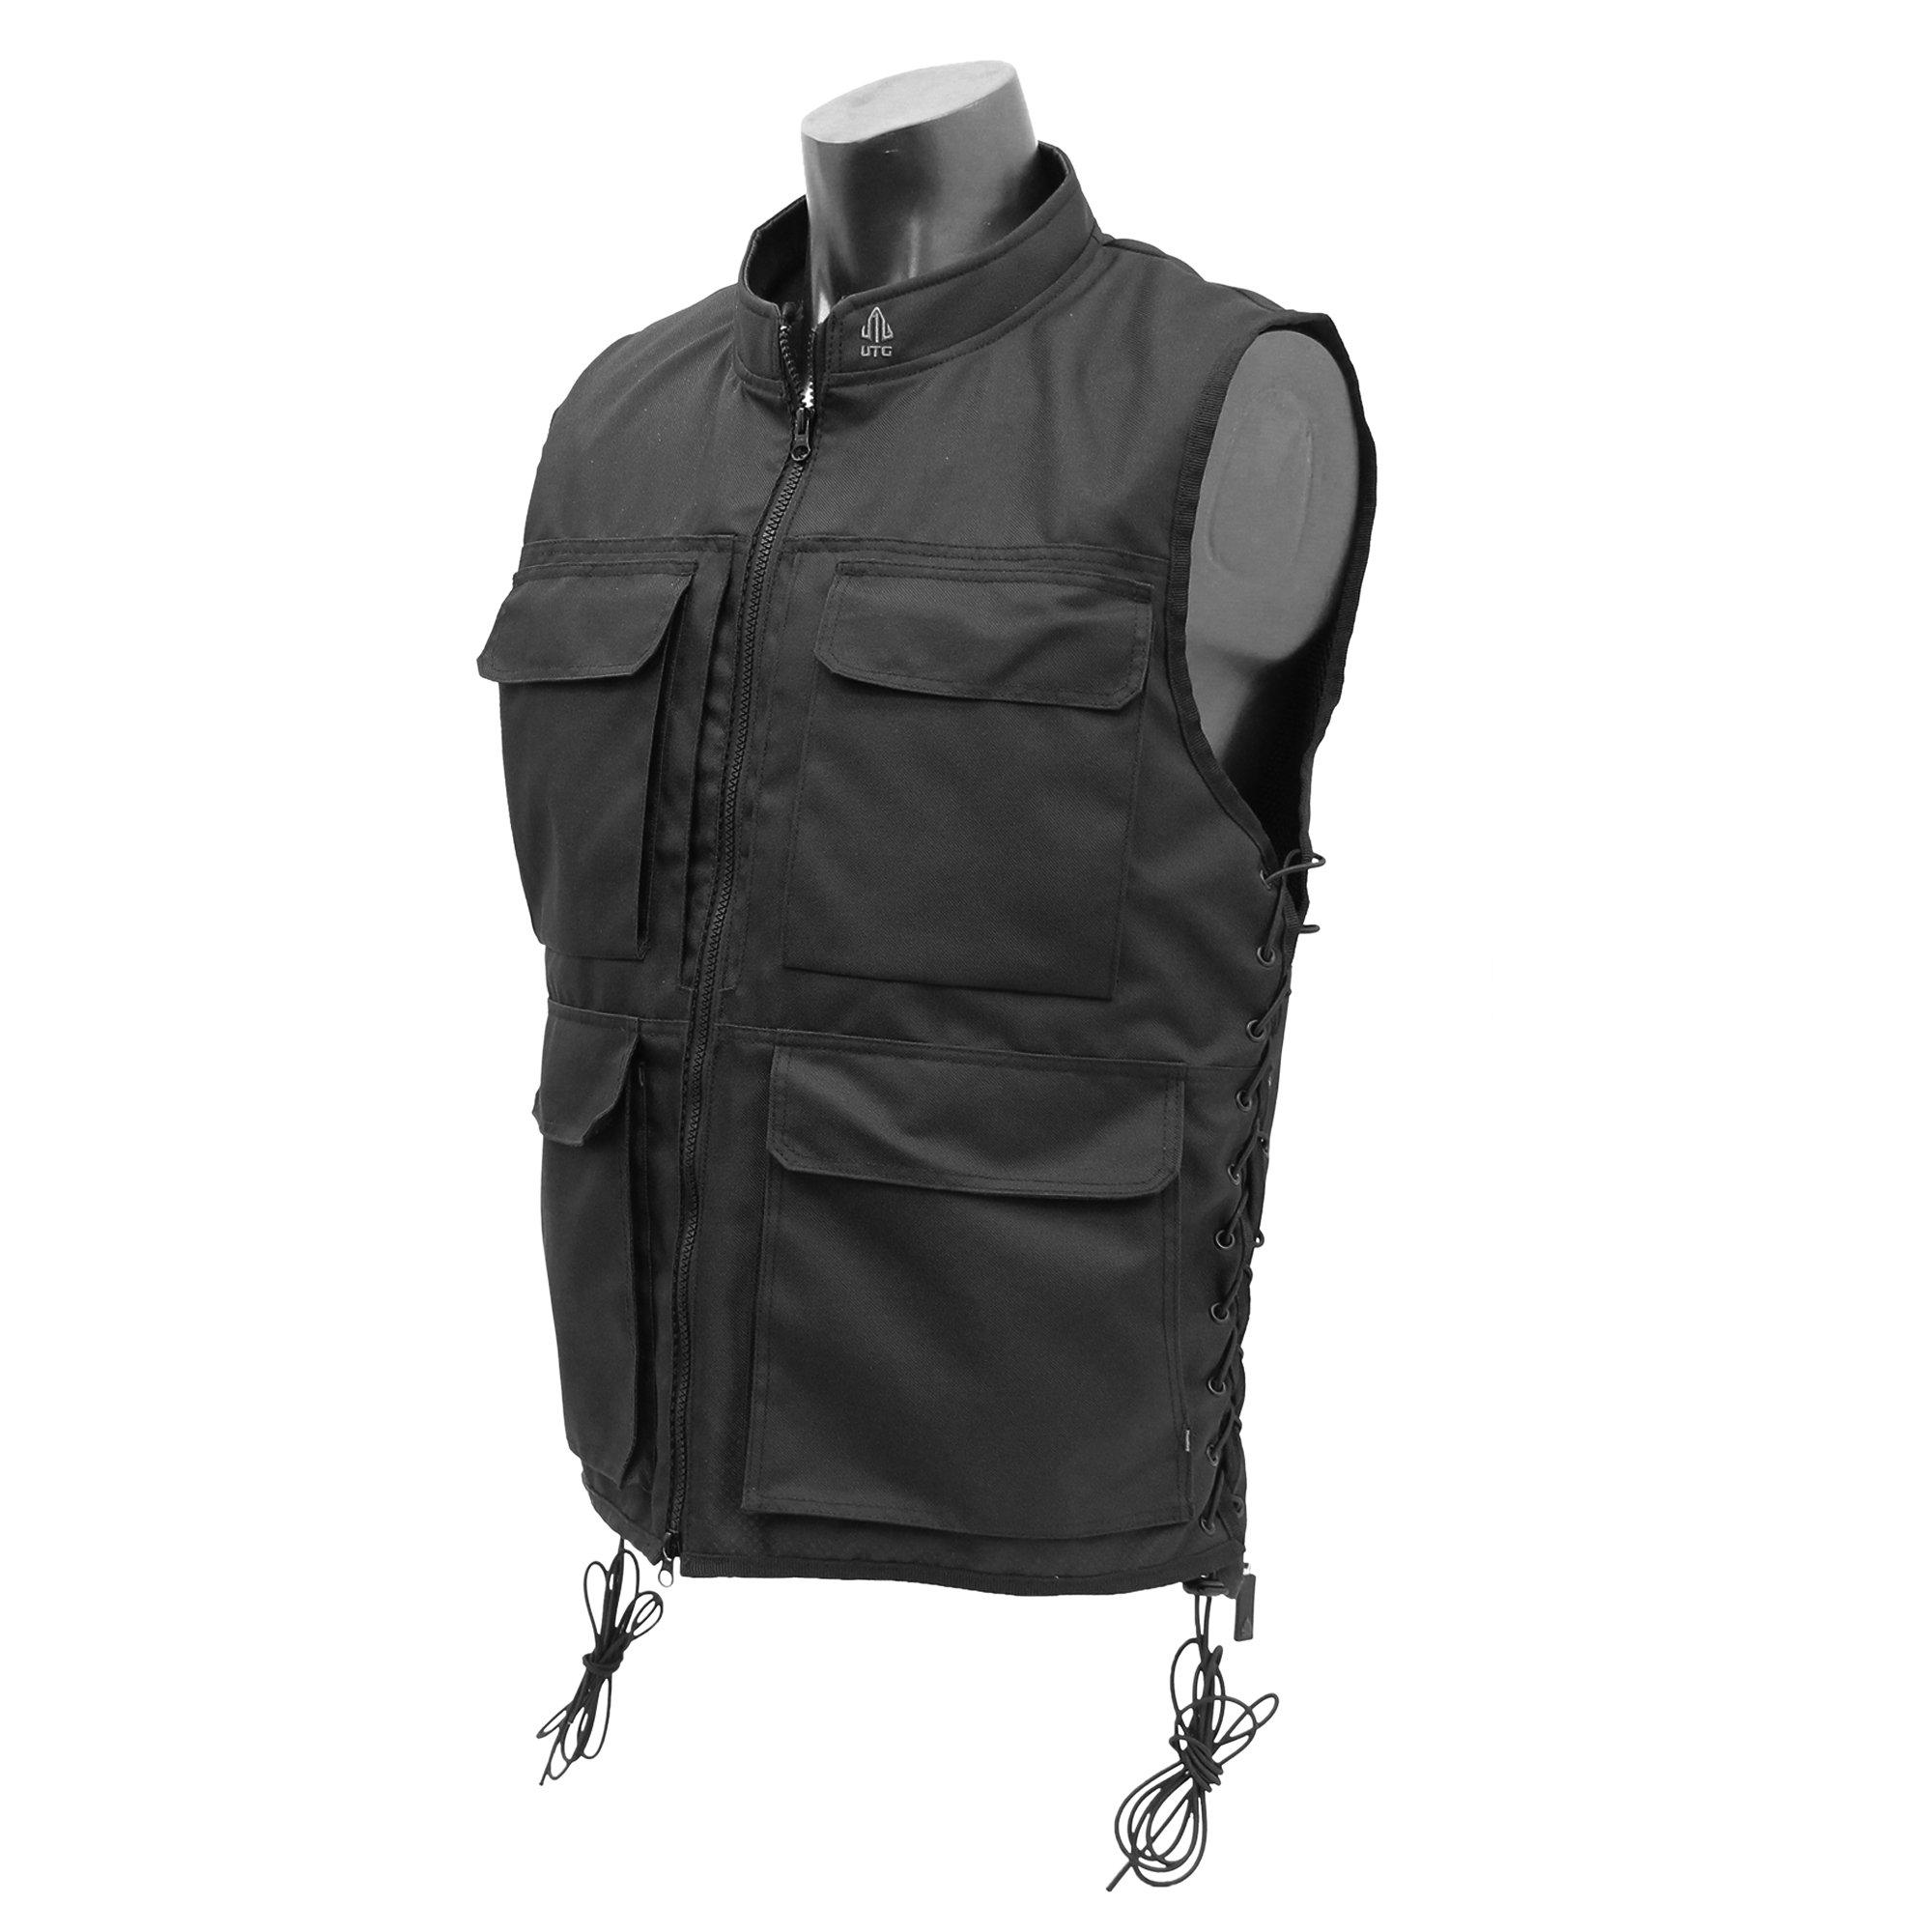 UTG True Hunter Male Sporting Vest (M to XL), Black by UTG